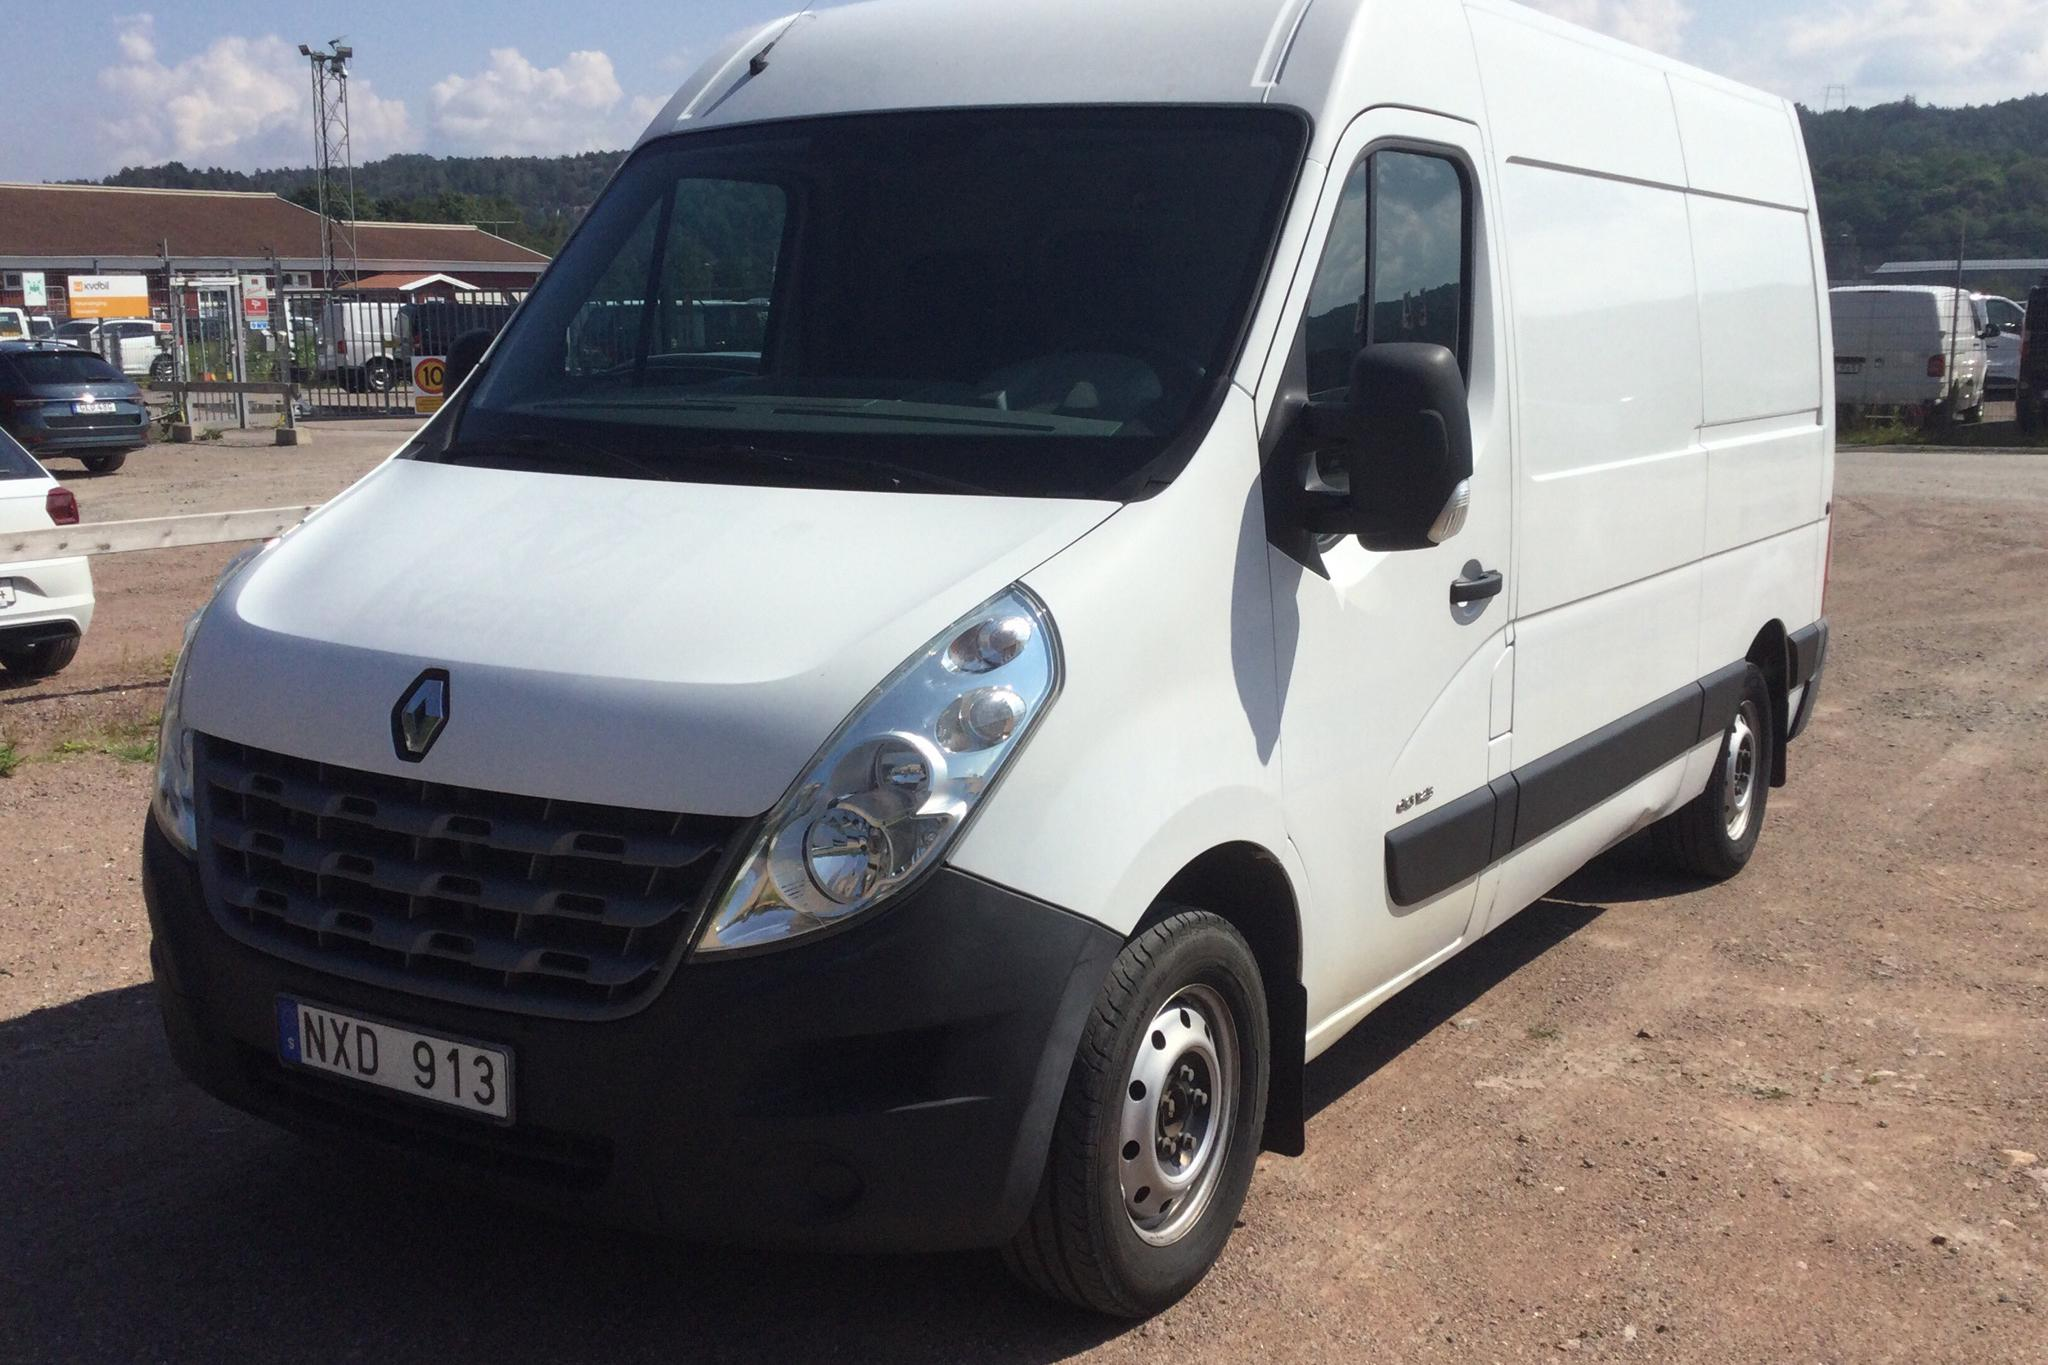 Renault Master 2.3 dCi FAP 2WD (125hk) - 13 342 mil - Manuell - vit - 2014